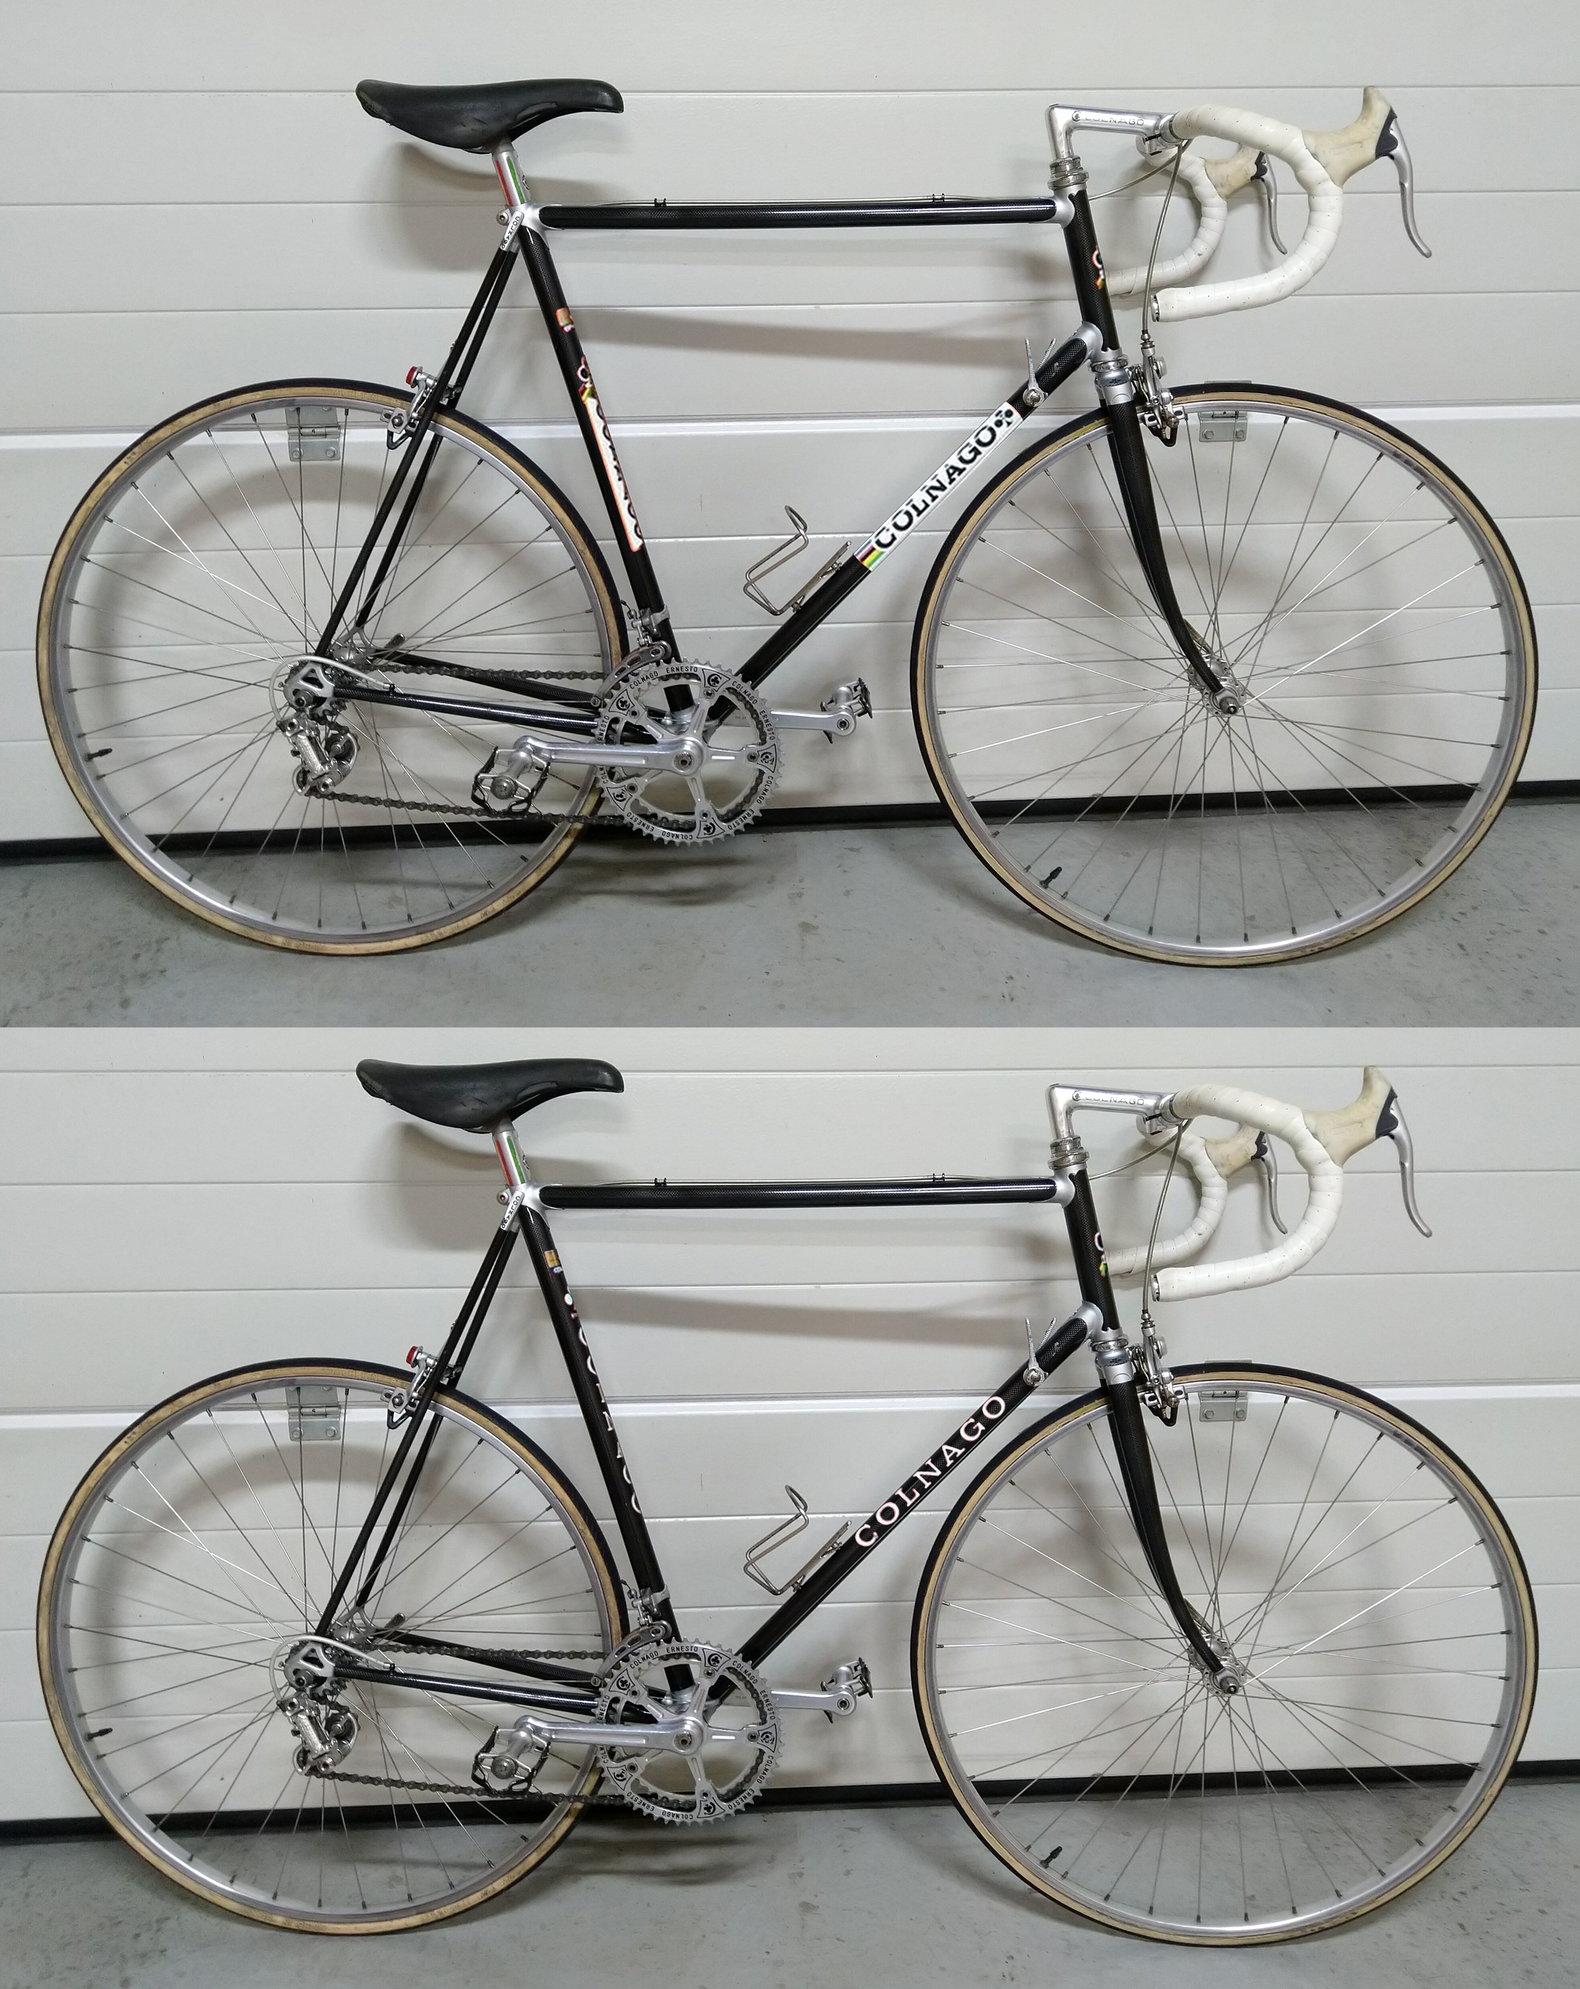 Set 127 Columbus Bicycle Decal Transfer Sticker